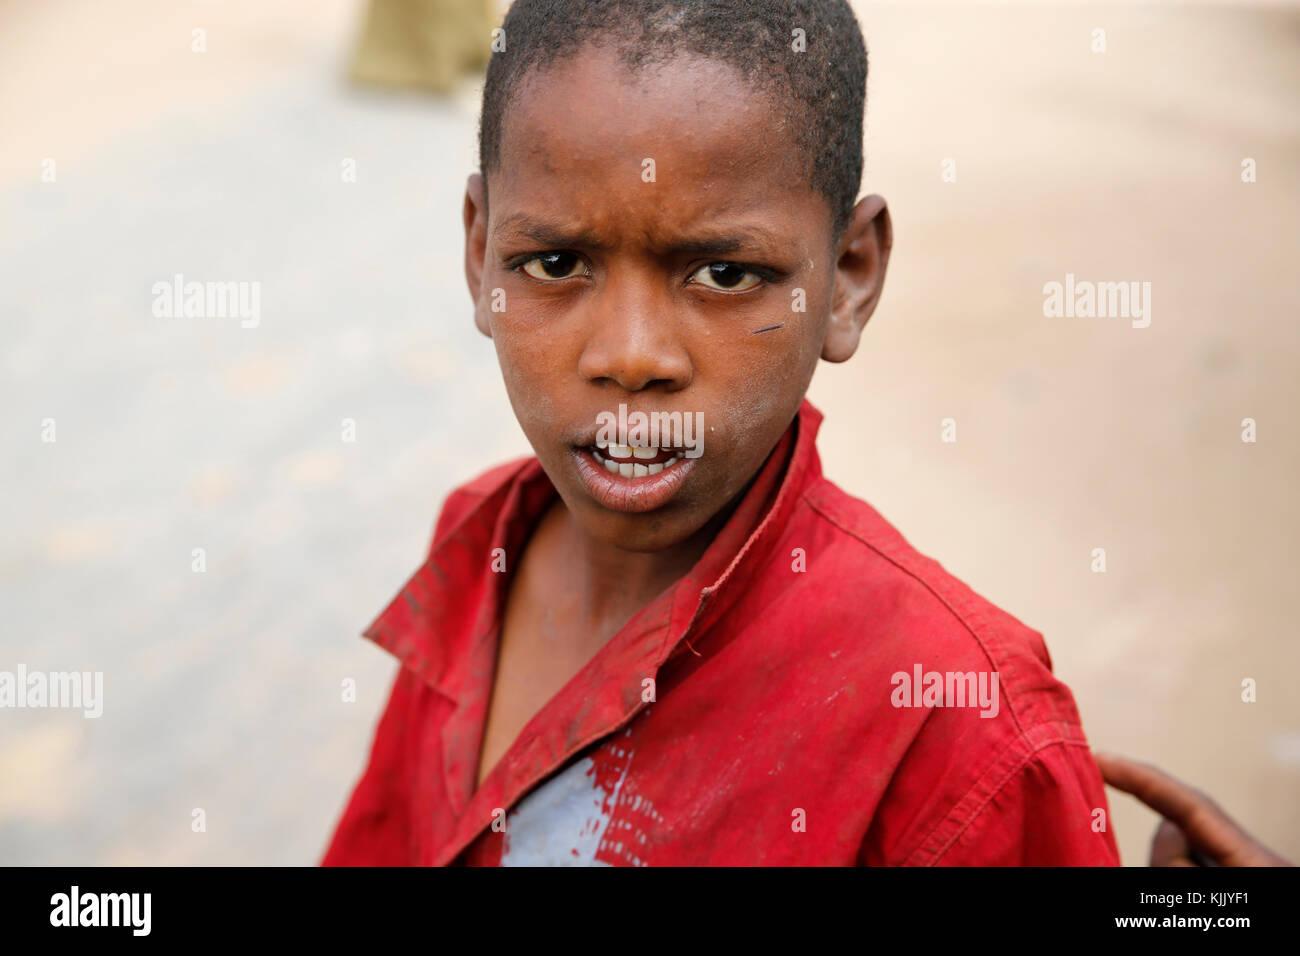 Senegalese boy. Senegal. - Stock Image